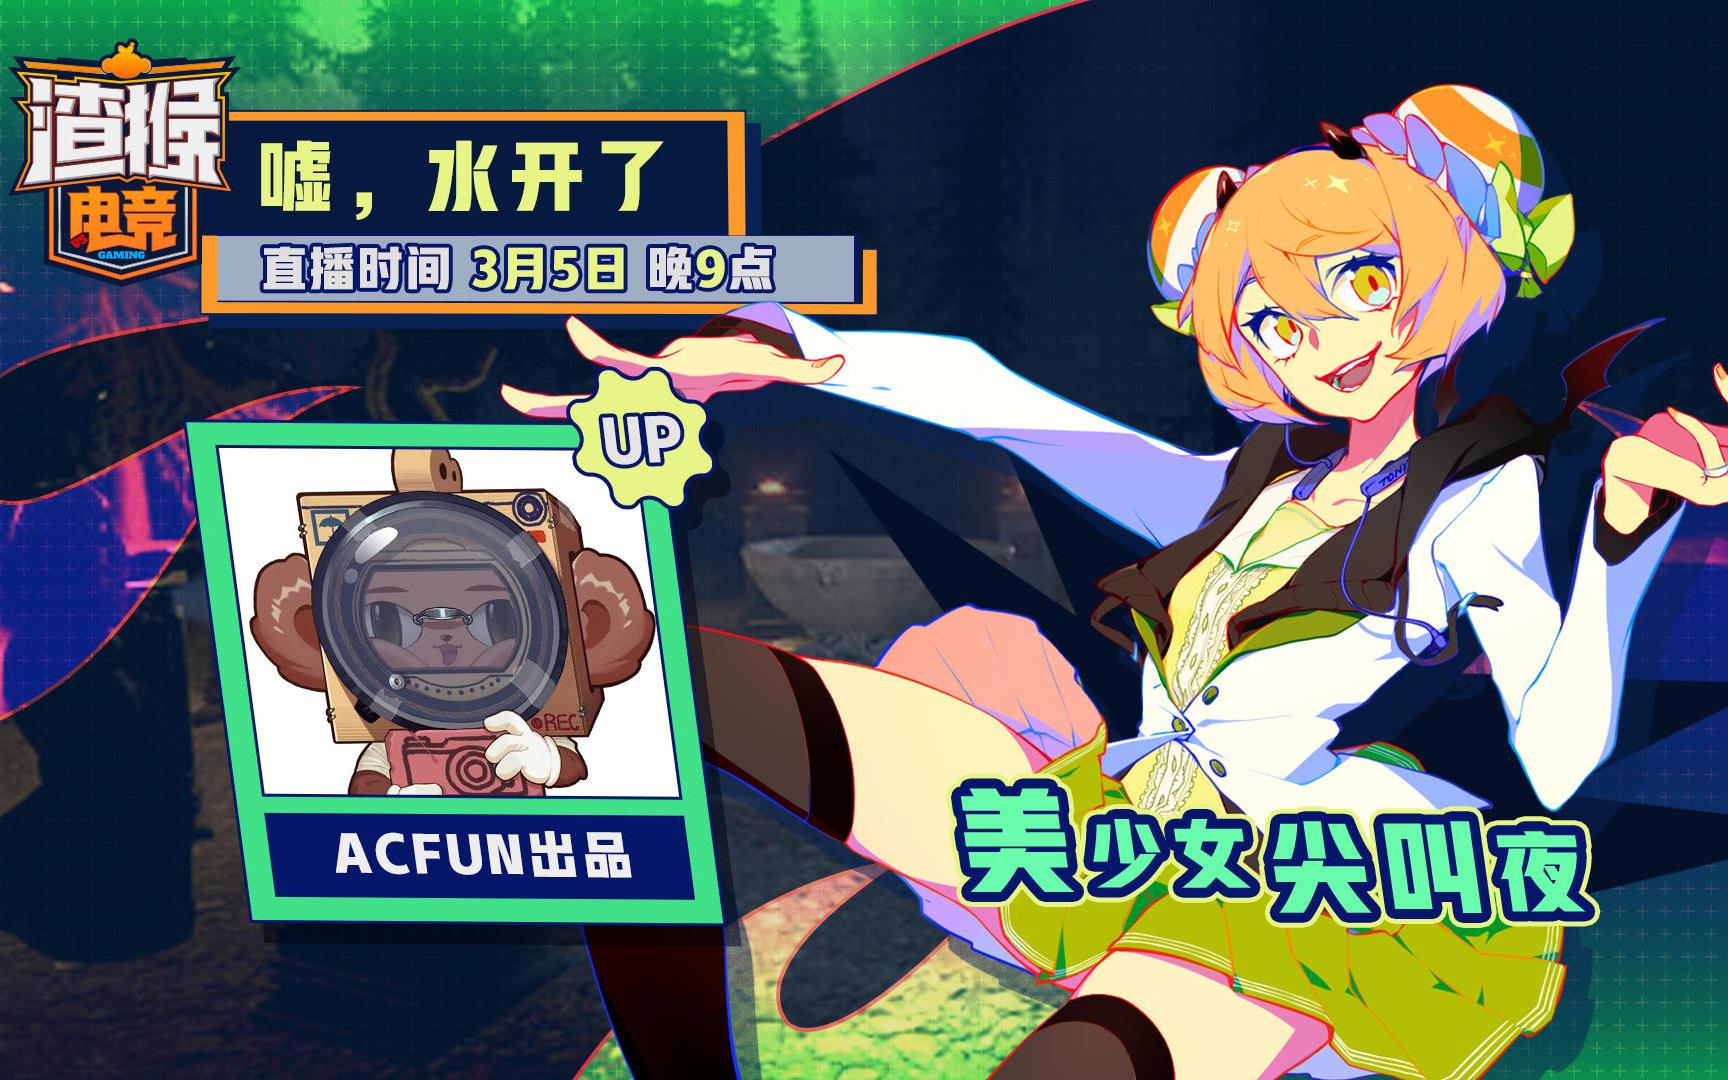 【 AcFun出品 录像】【渣猴电竞】听说有表情包? 03.05